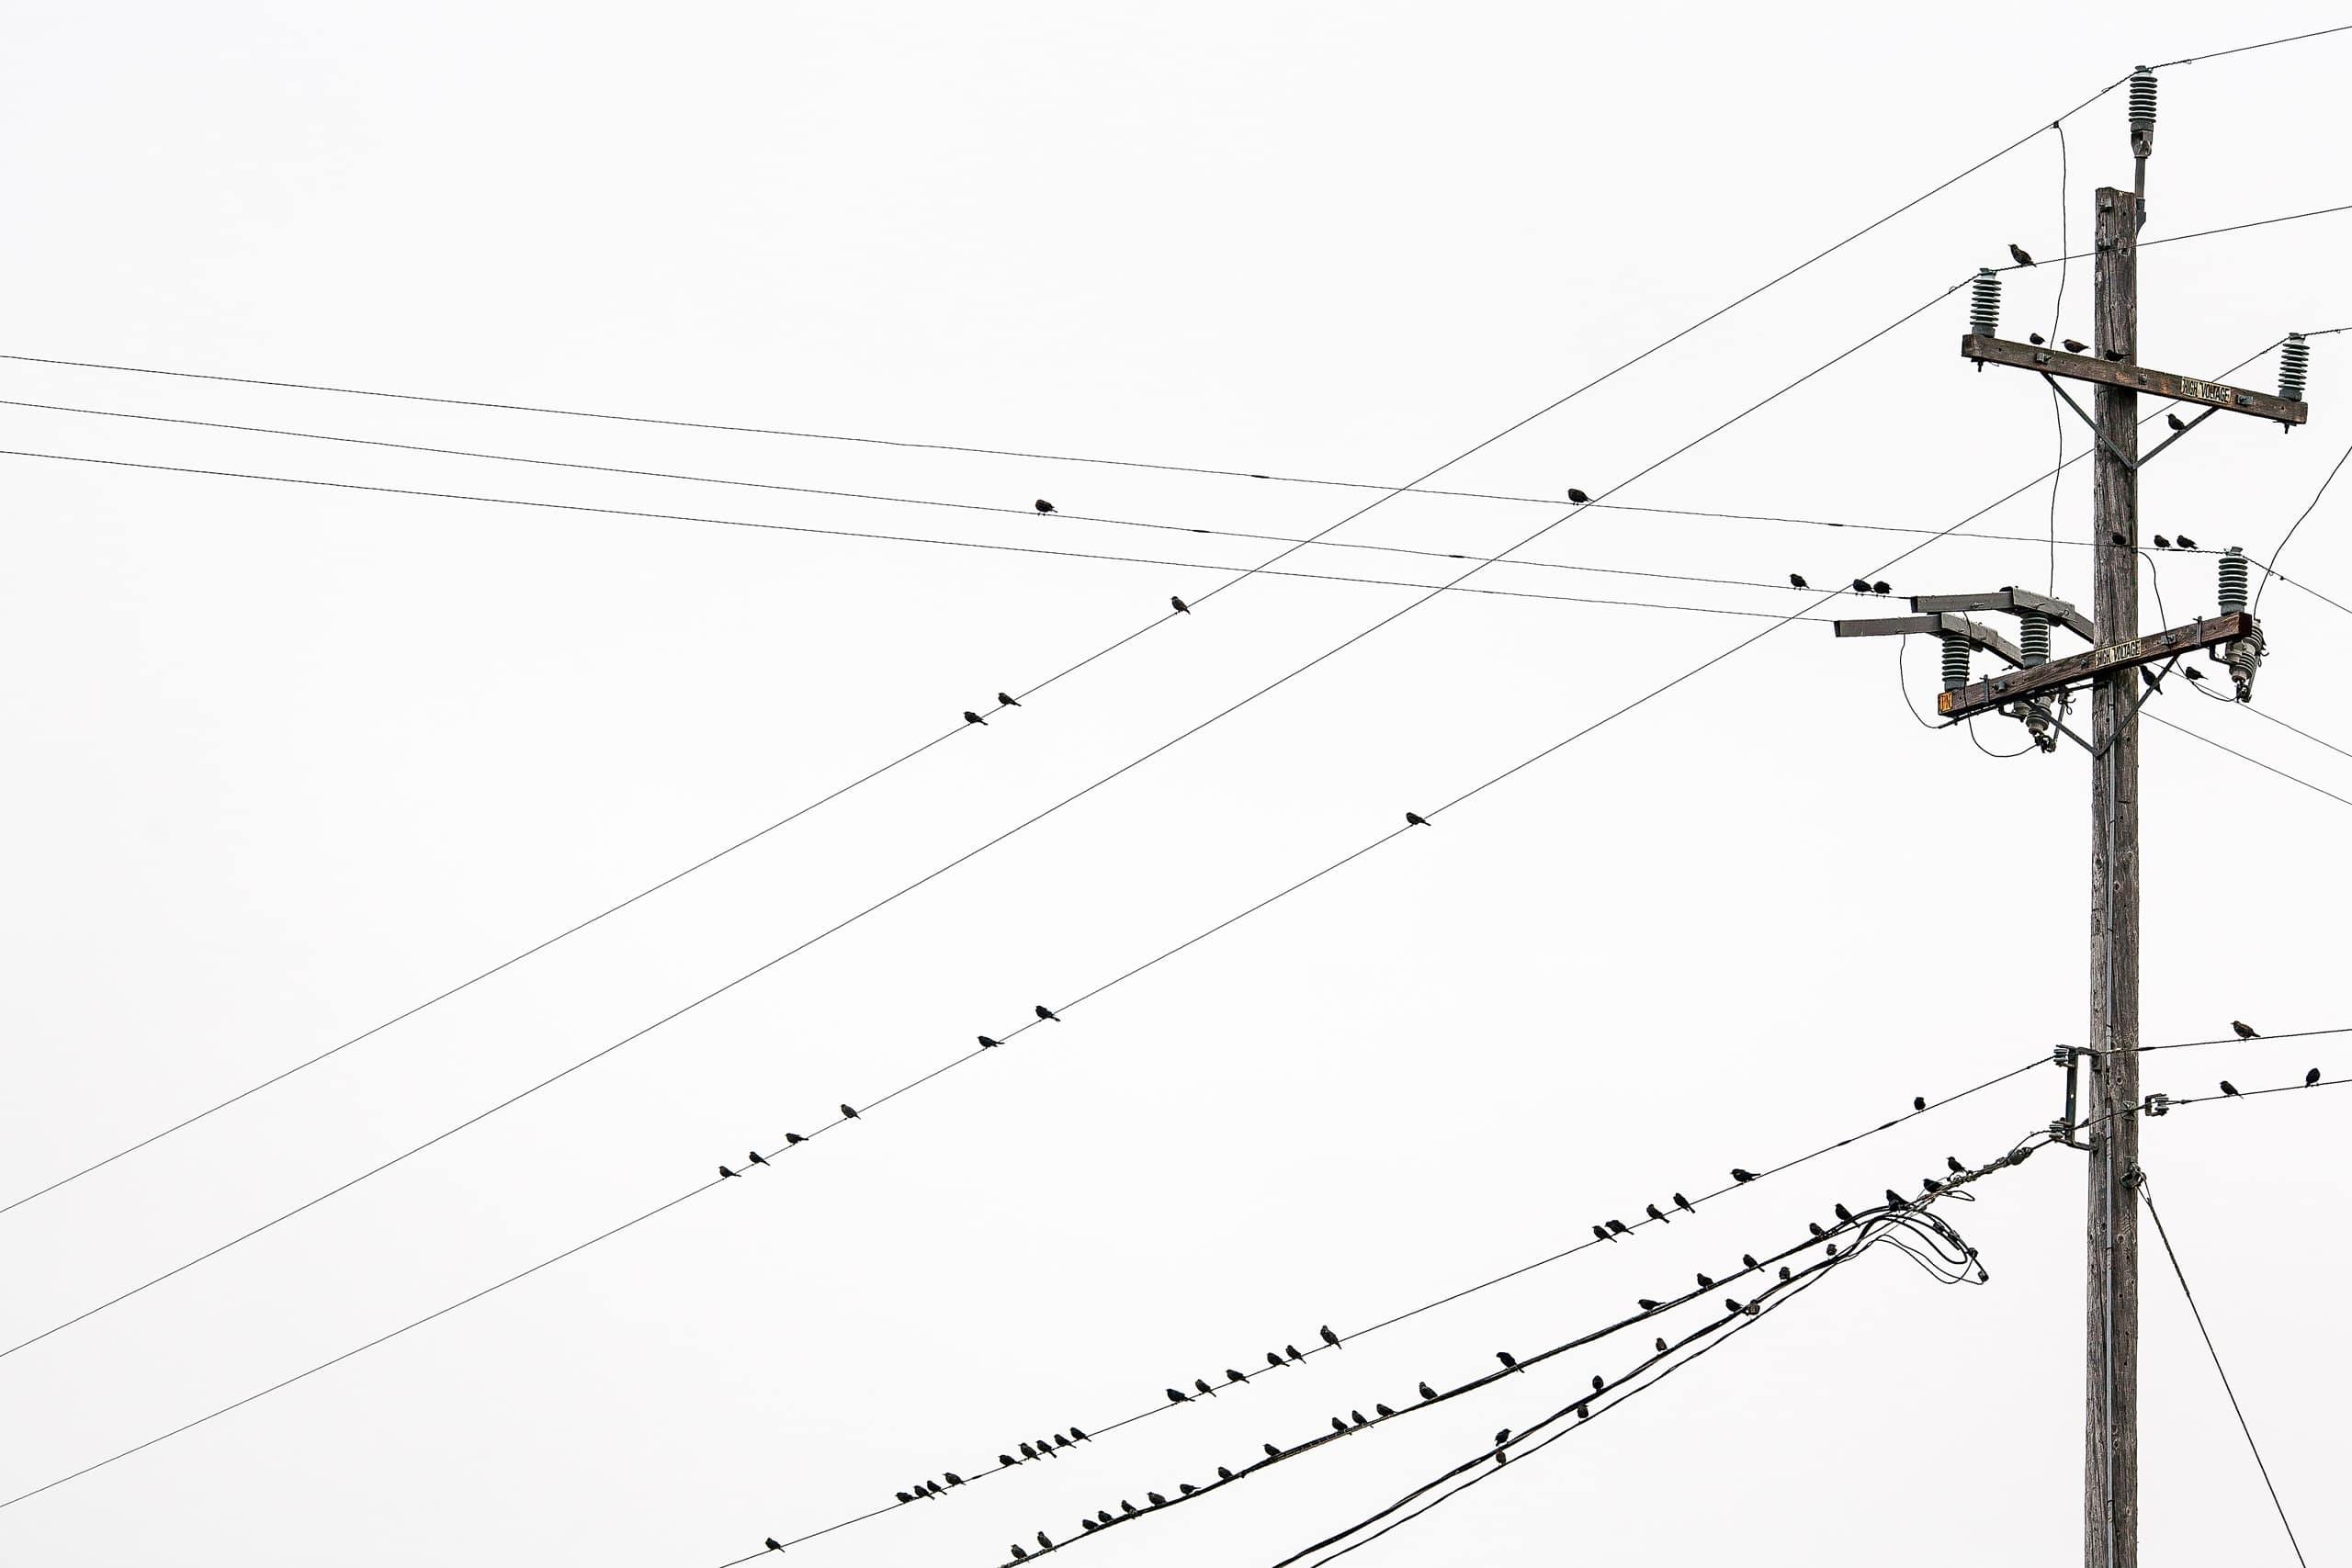 SANTA-CRUZ-WIREBIRDS-02-7778